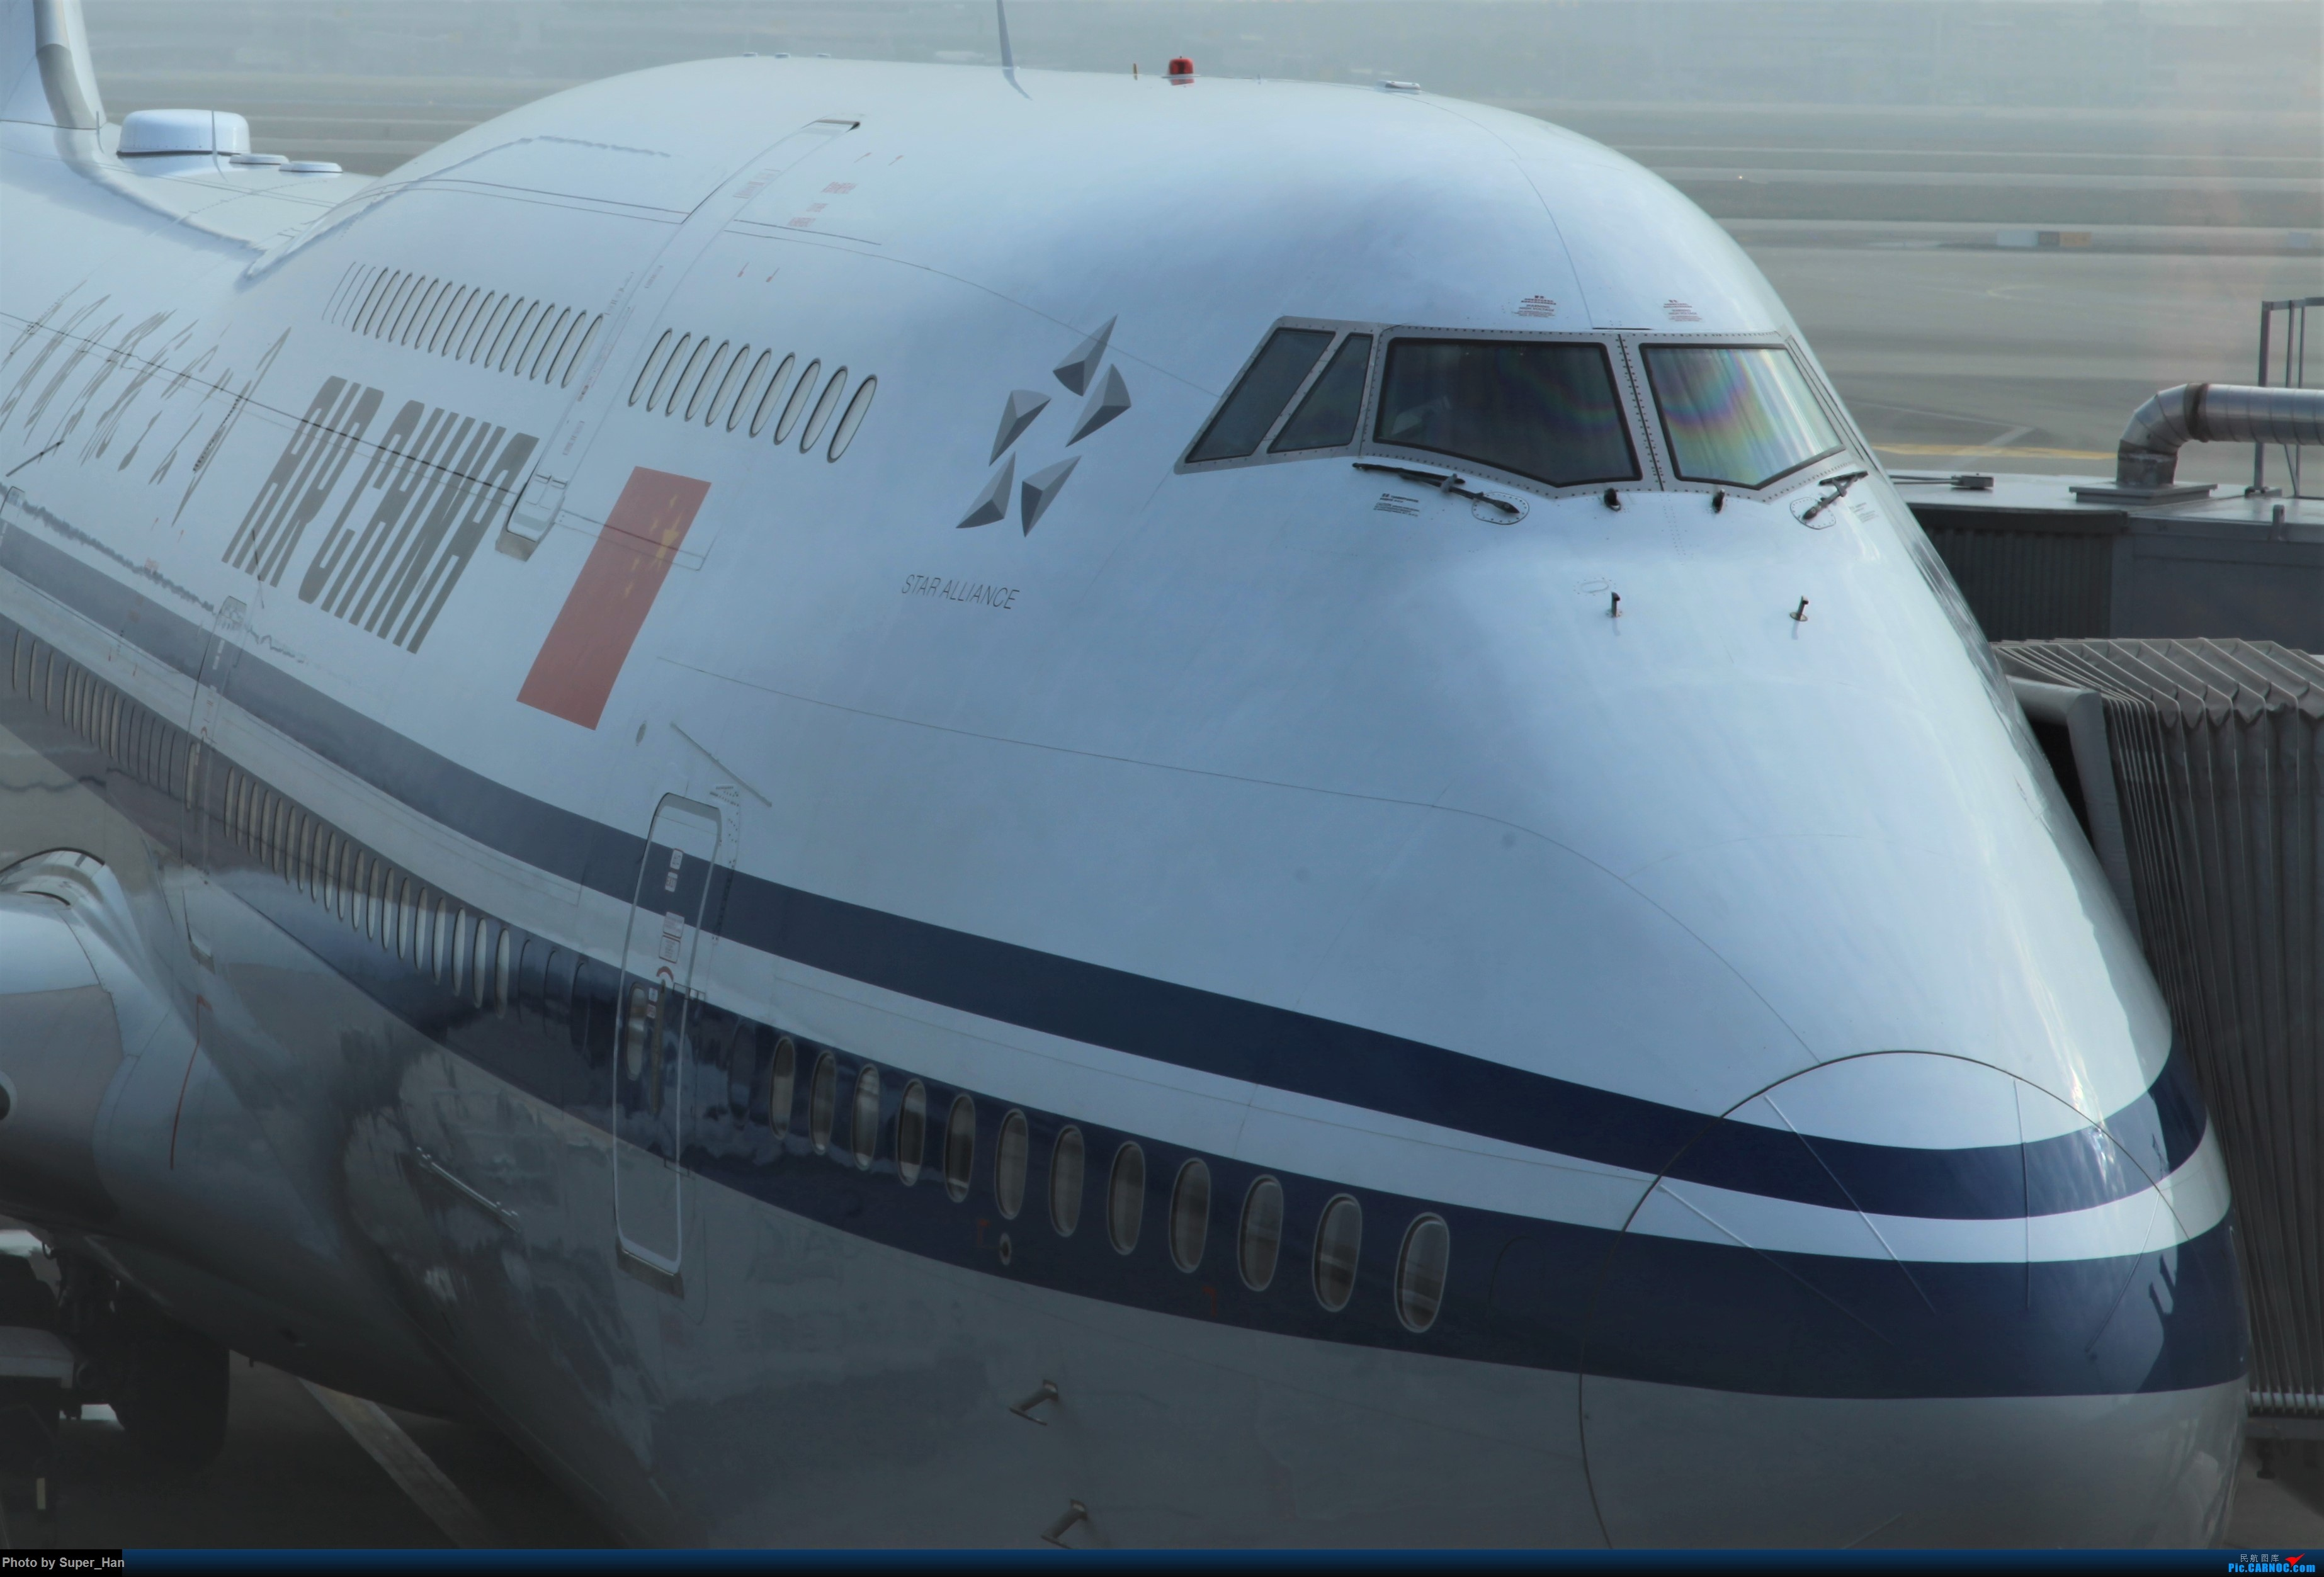 Re:[原创]2019虹桥出发飞北京第一拍 BOEING 747-8I B-2482 中国上海虹桥国际机场